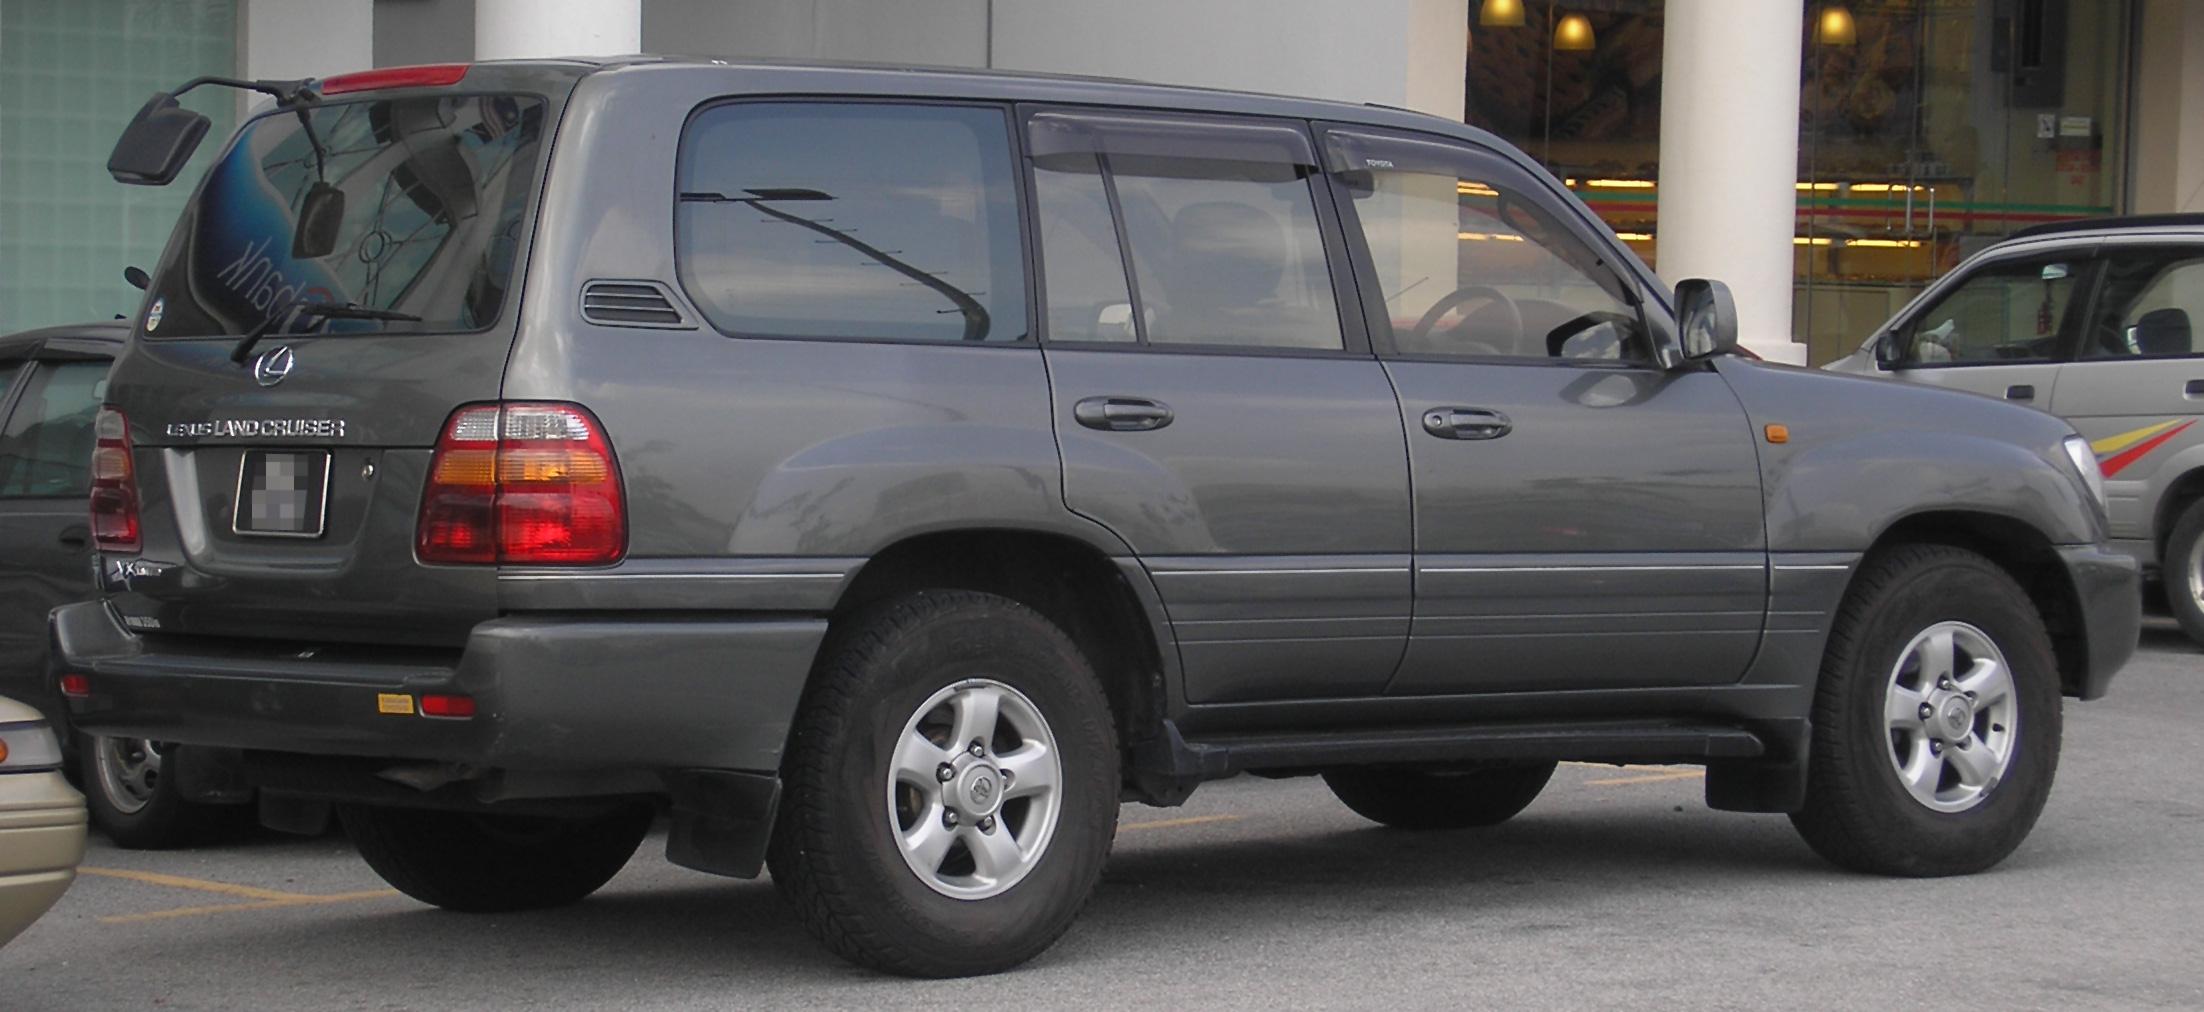 Toyota Land Cruiser Wiki >> File:Lexus LX (second generation) (470, Land Cruiser) (rear), Serdang.jpg - Wikimedia Commons